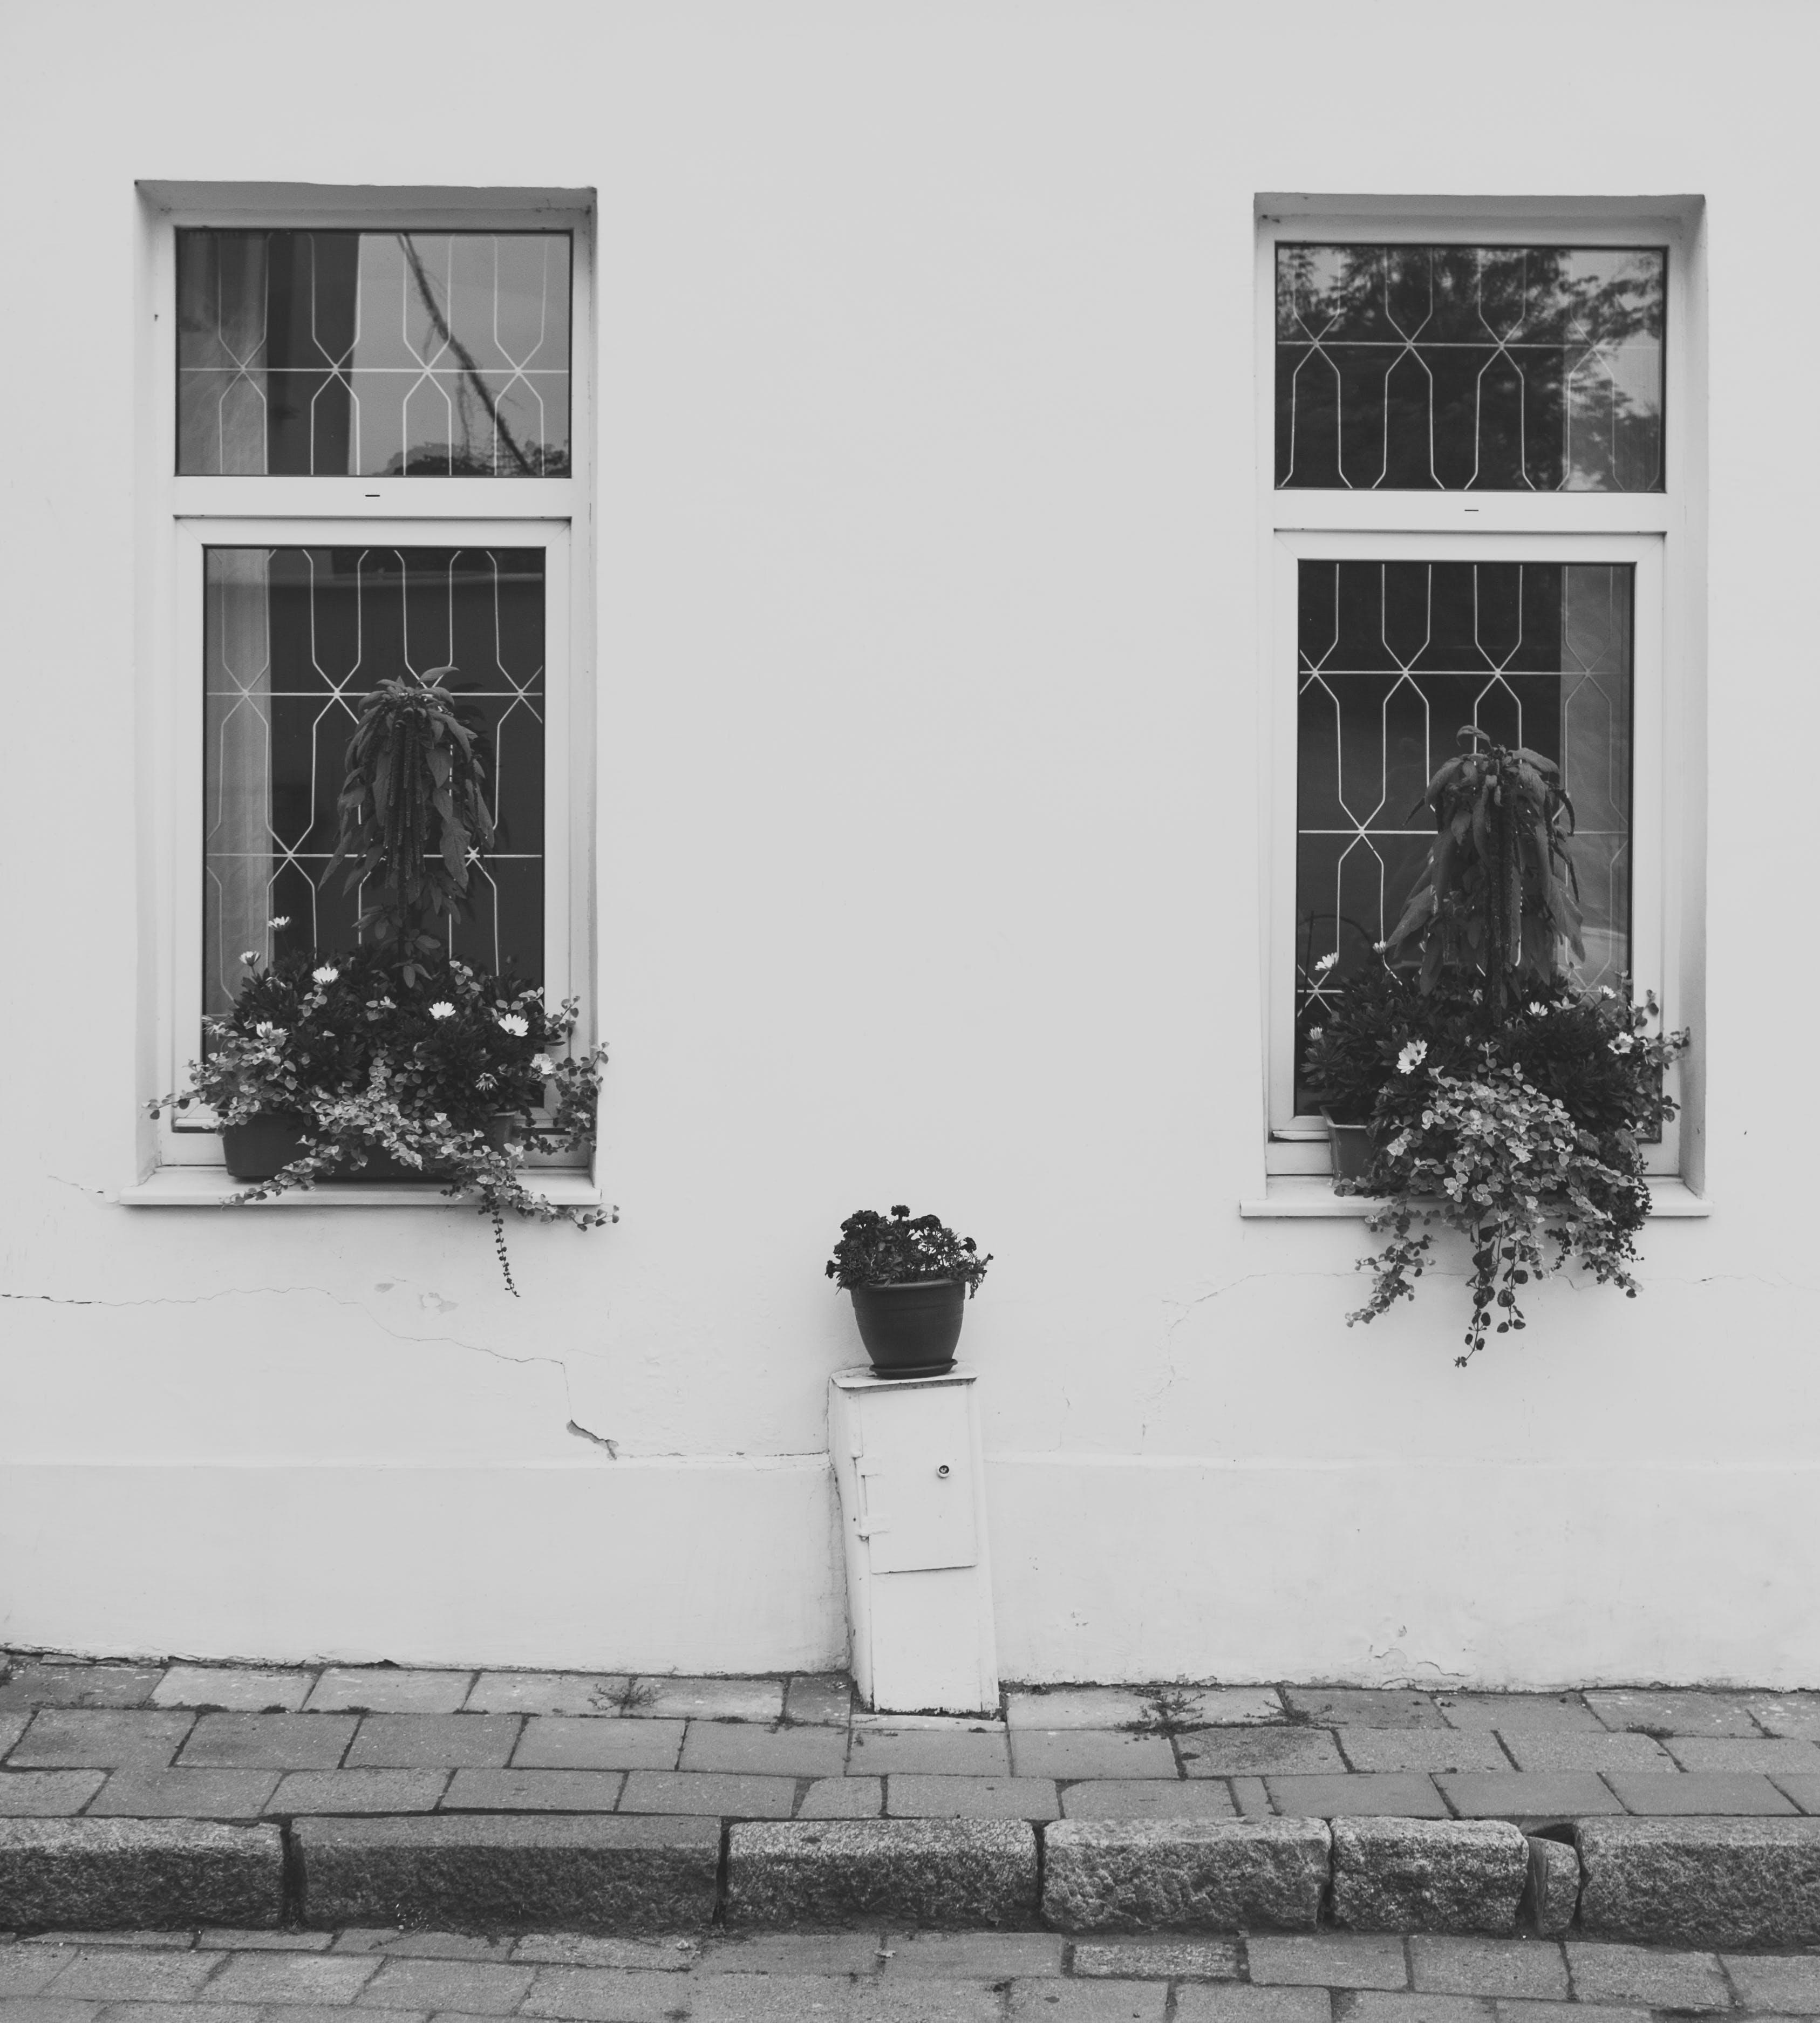 black-and-white, building, flower pot